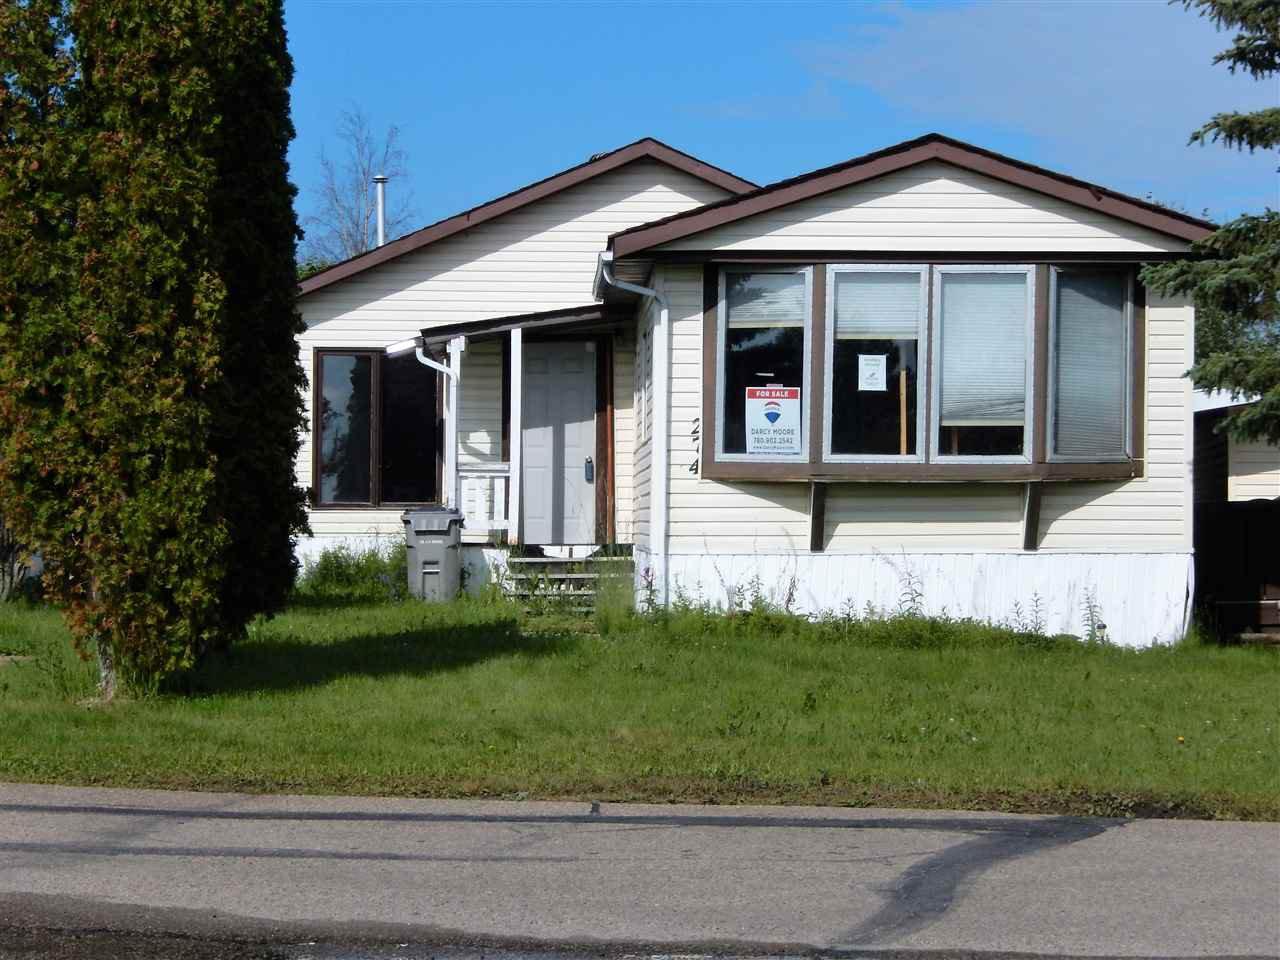 Homes for Sale Edmonton $0-$100,000